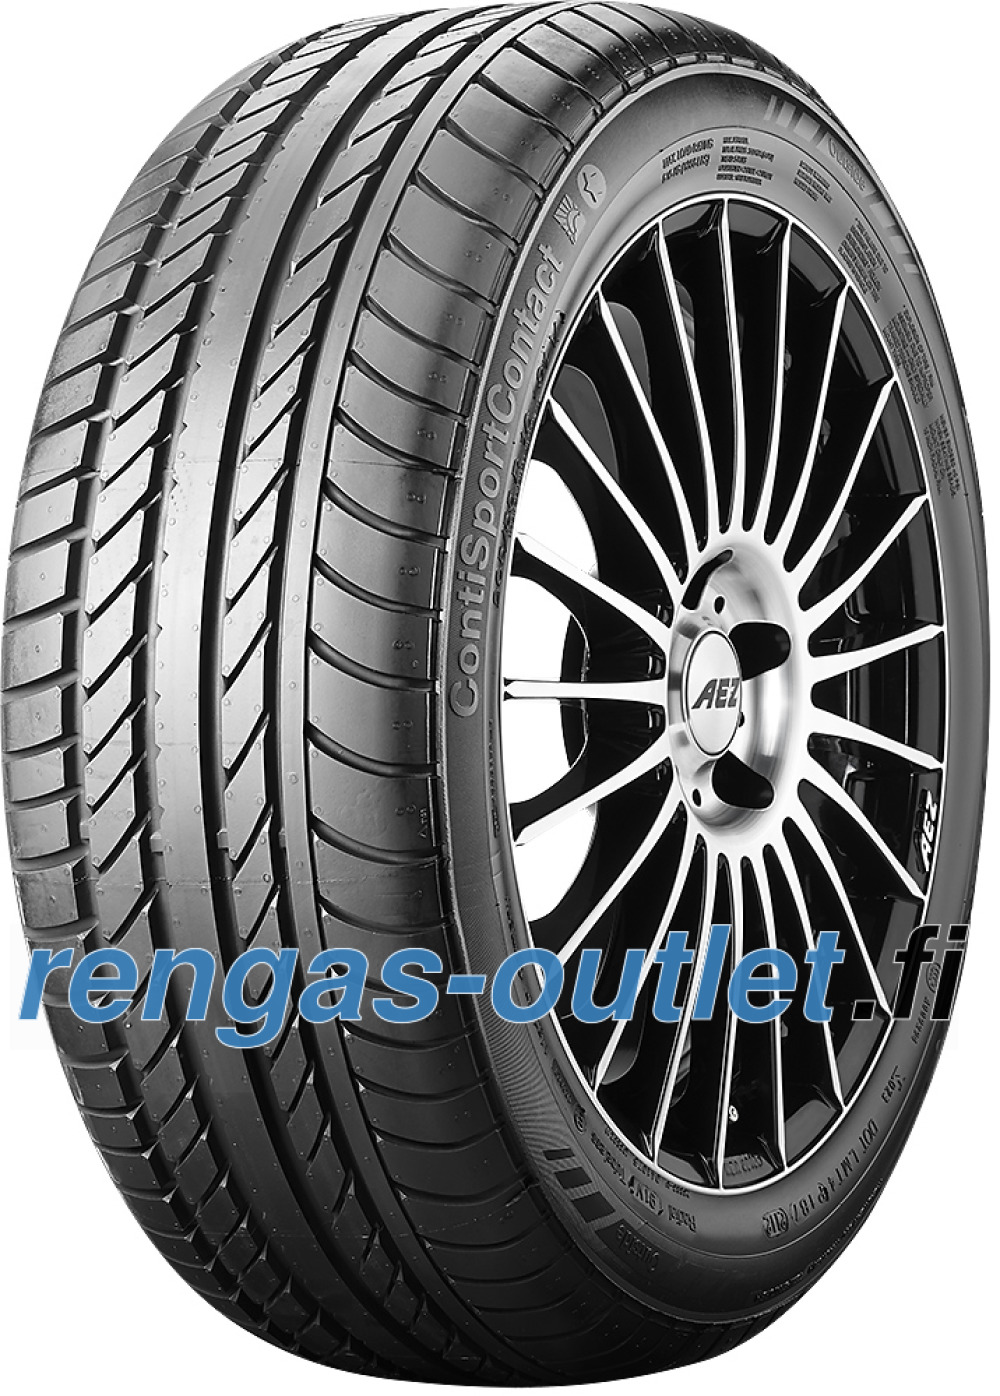 Continental SportContact ( 245/45 ZR16 94Y vannealueen ripalla , N2 )